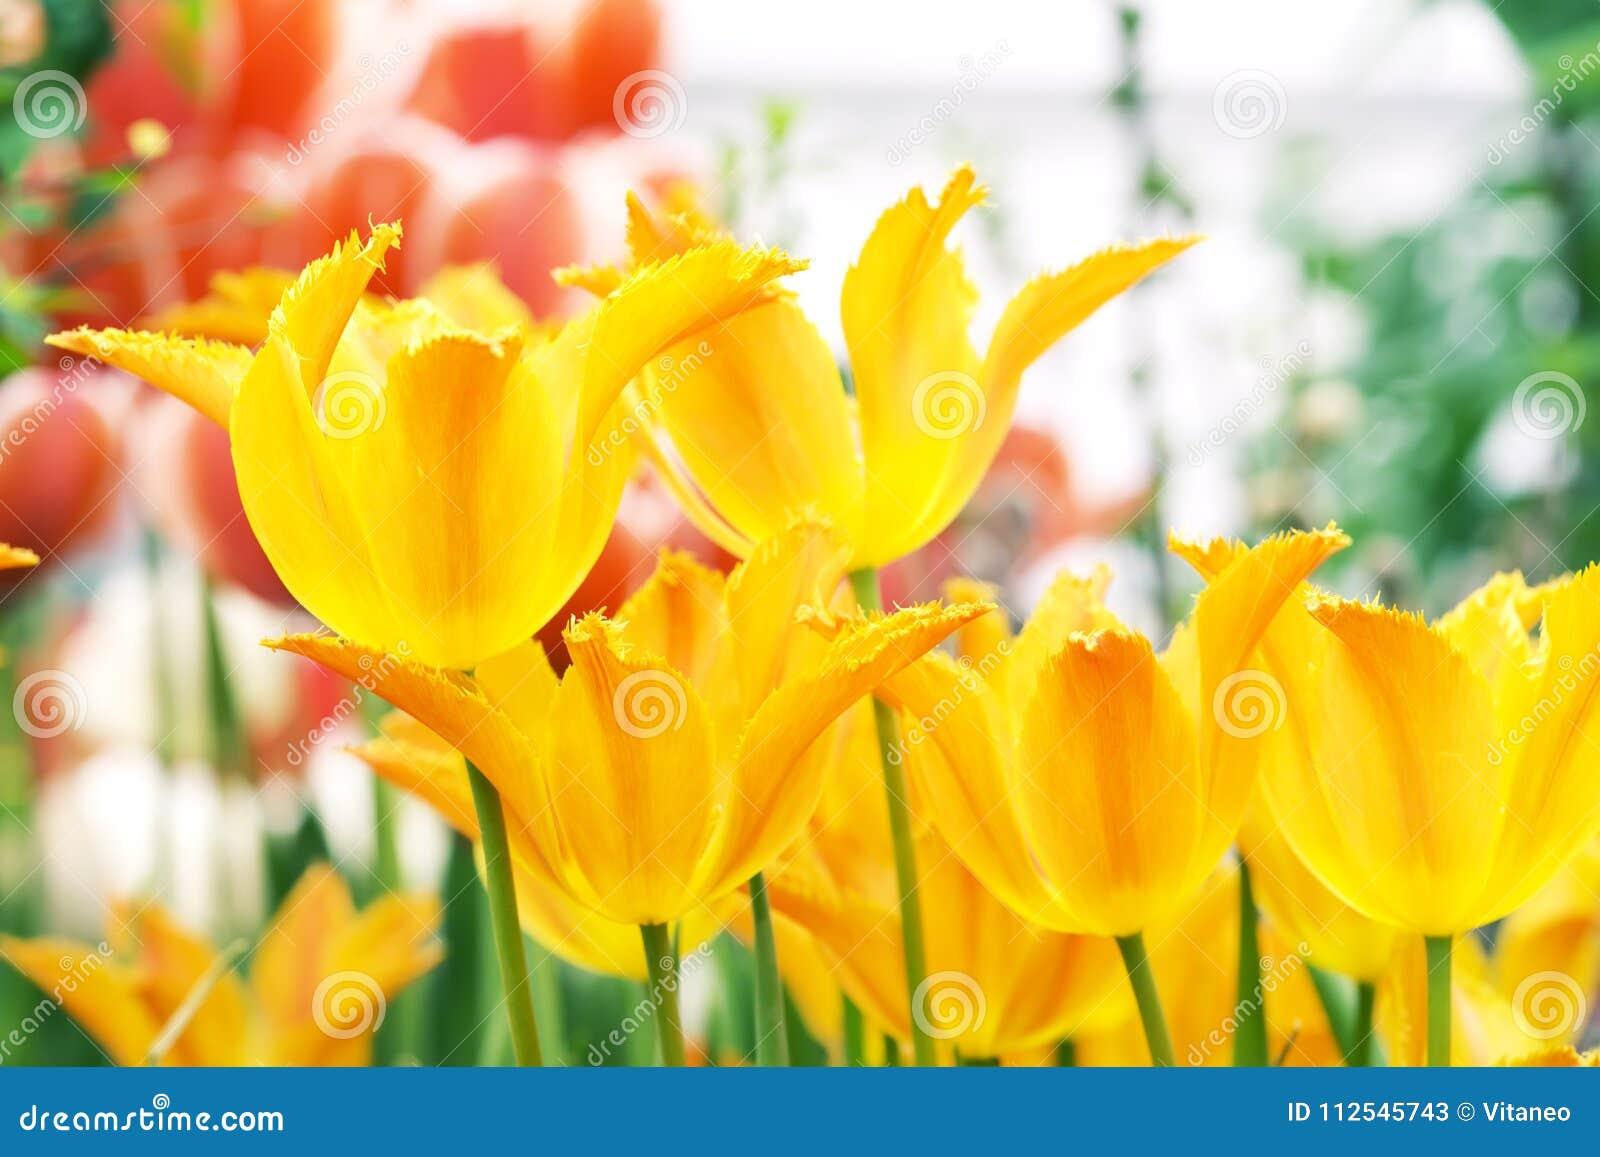 Beautiful Tulips Flowering In The Garden Stock Image Image Of